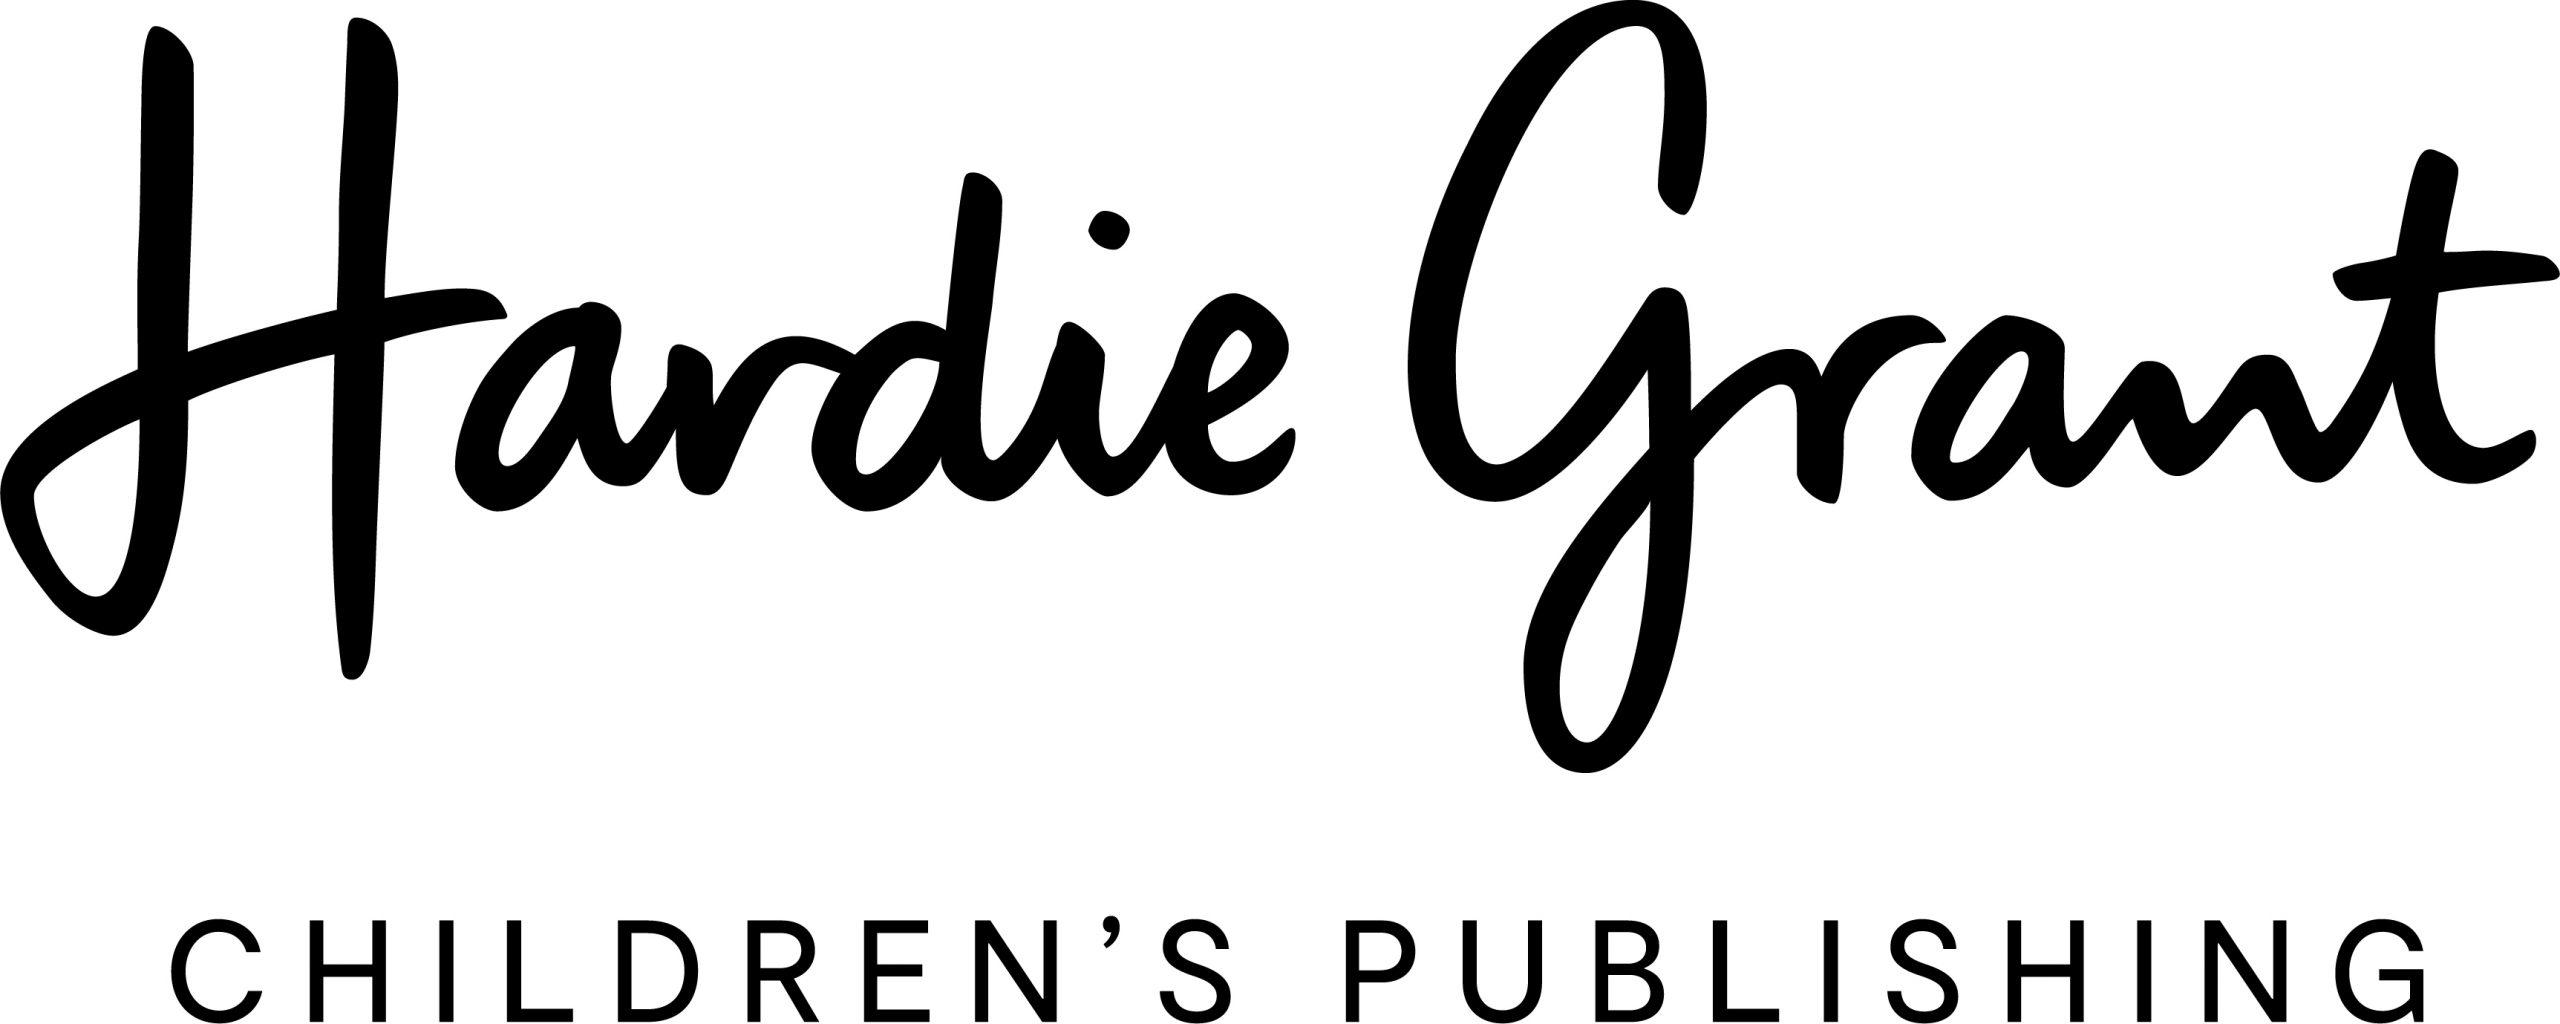 Hardie Grant Childrens Publishing